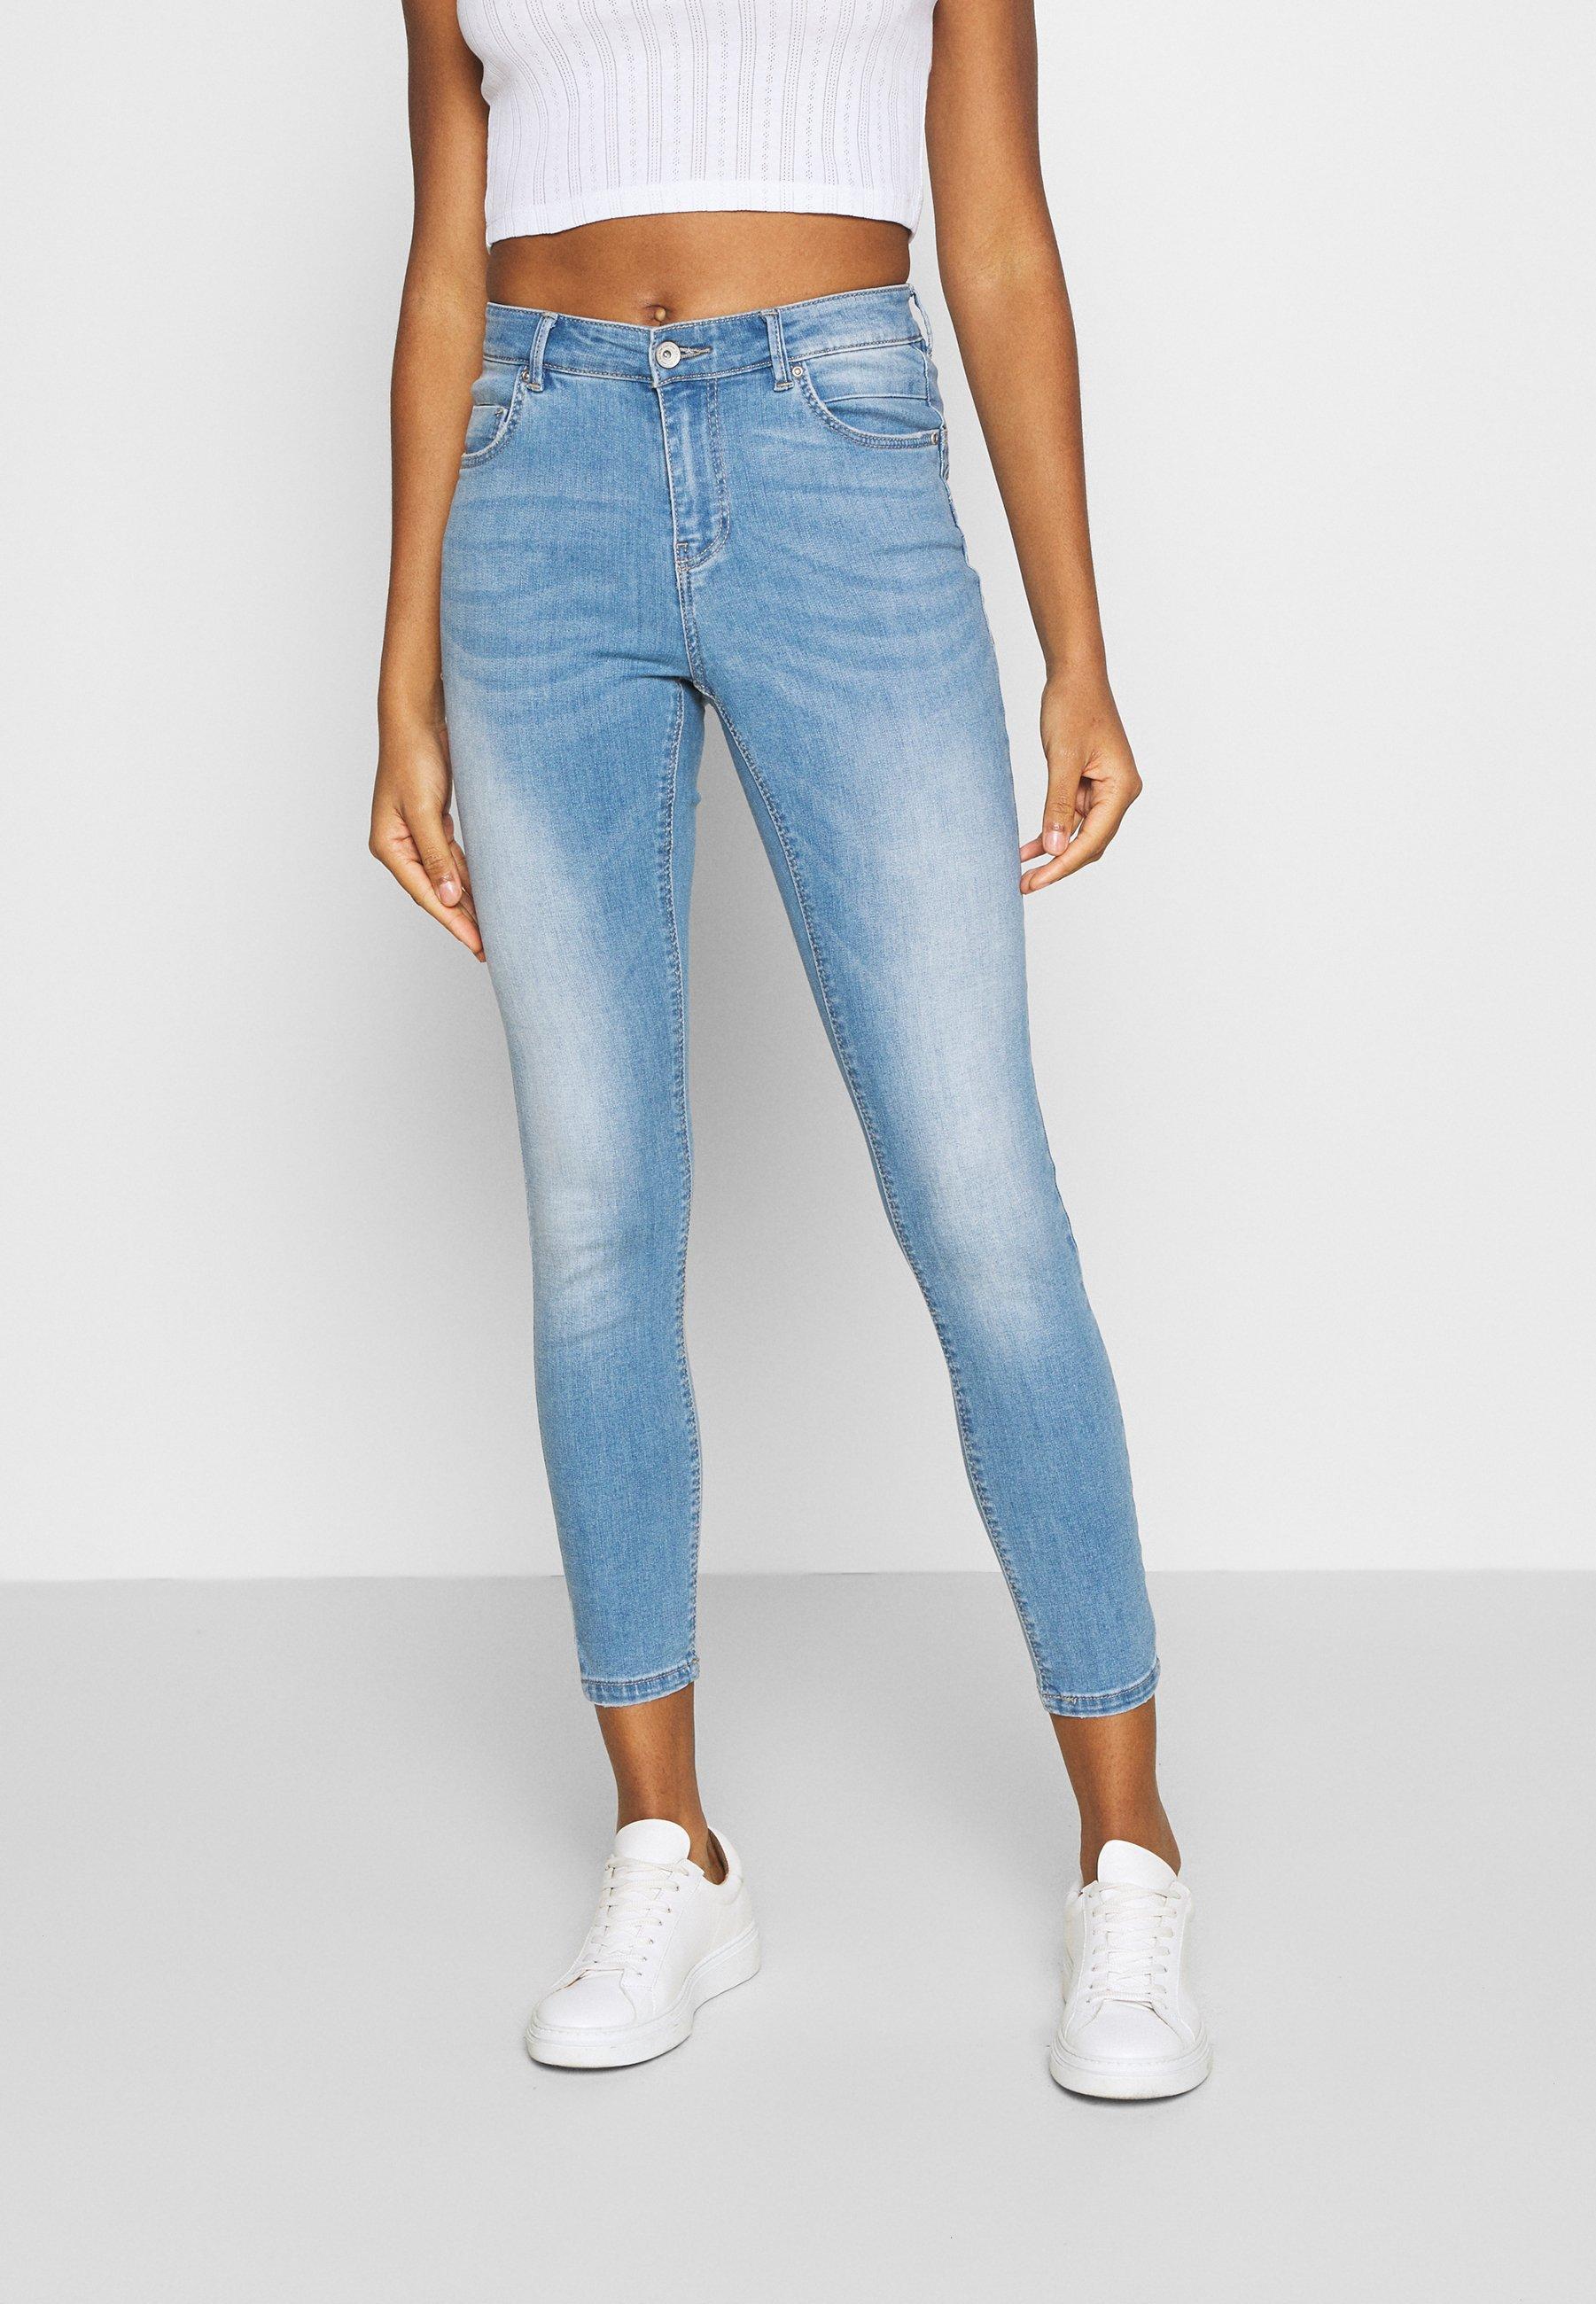 Women ONLANTA LIFE REG SK ANK PUSHUP   - Jeans Skinny Fit - light blue